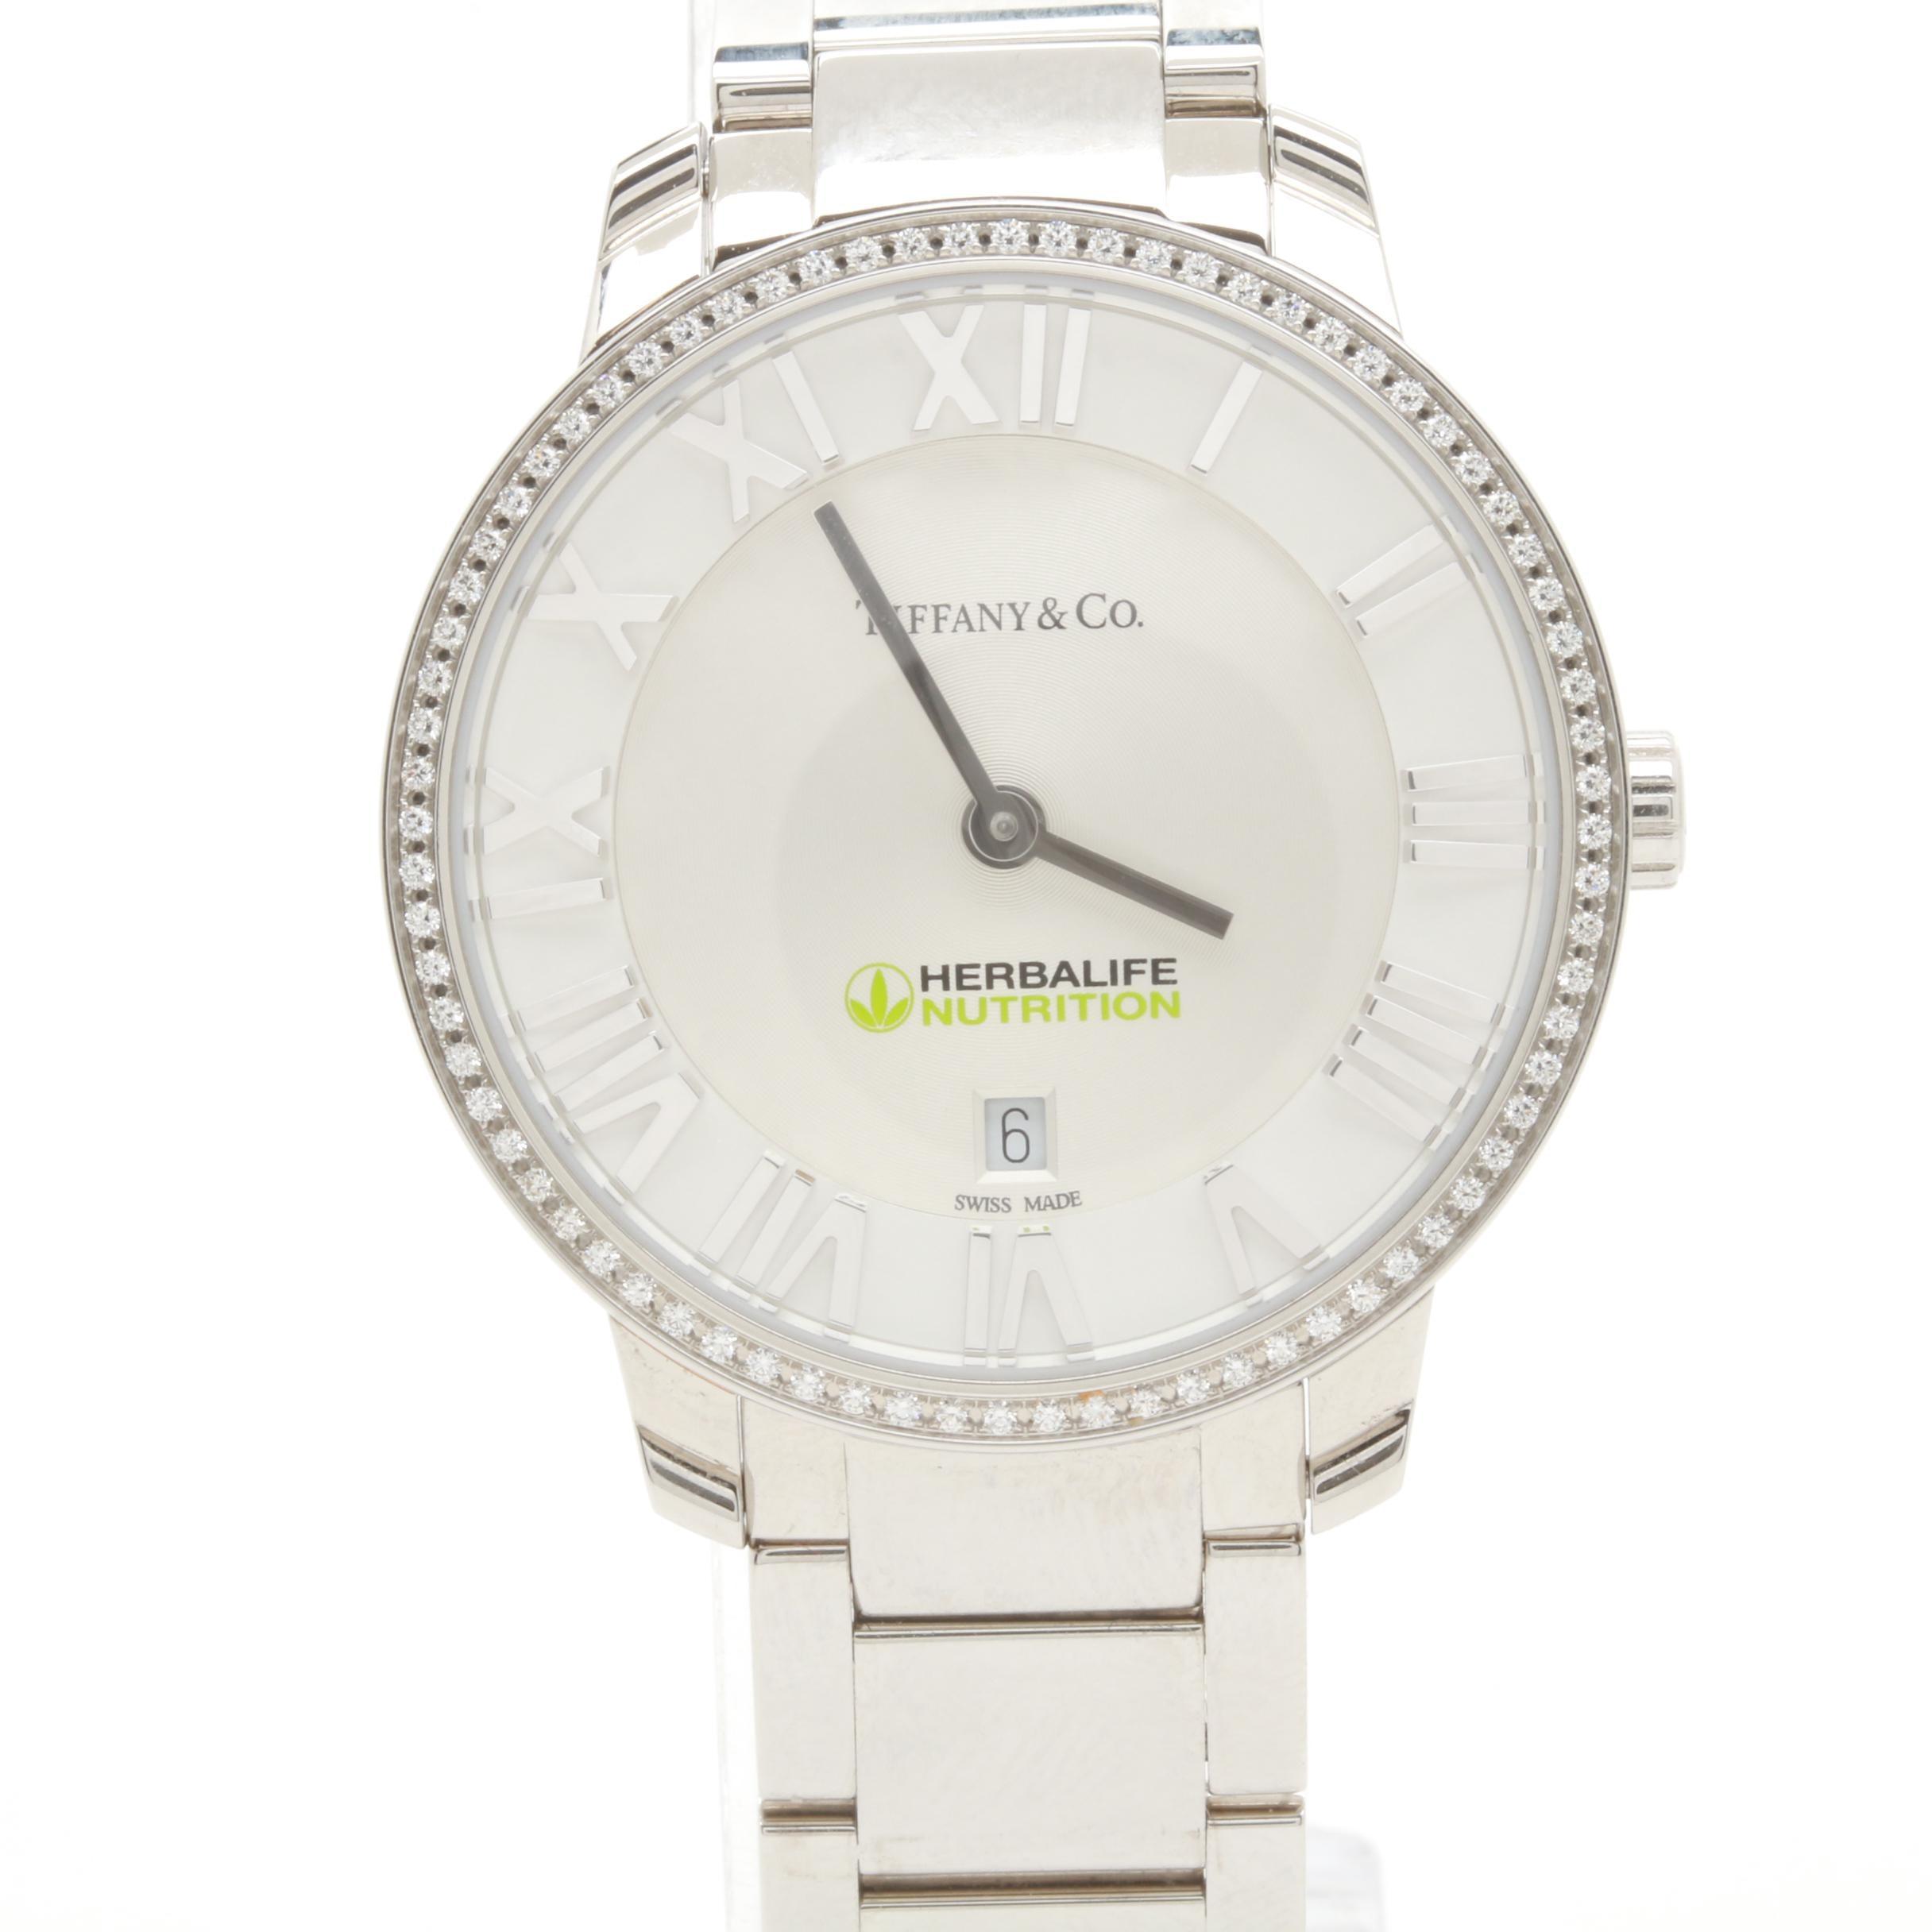 Tiffany & Co. Atlas Stainless Steel Diamond Wristwatch